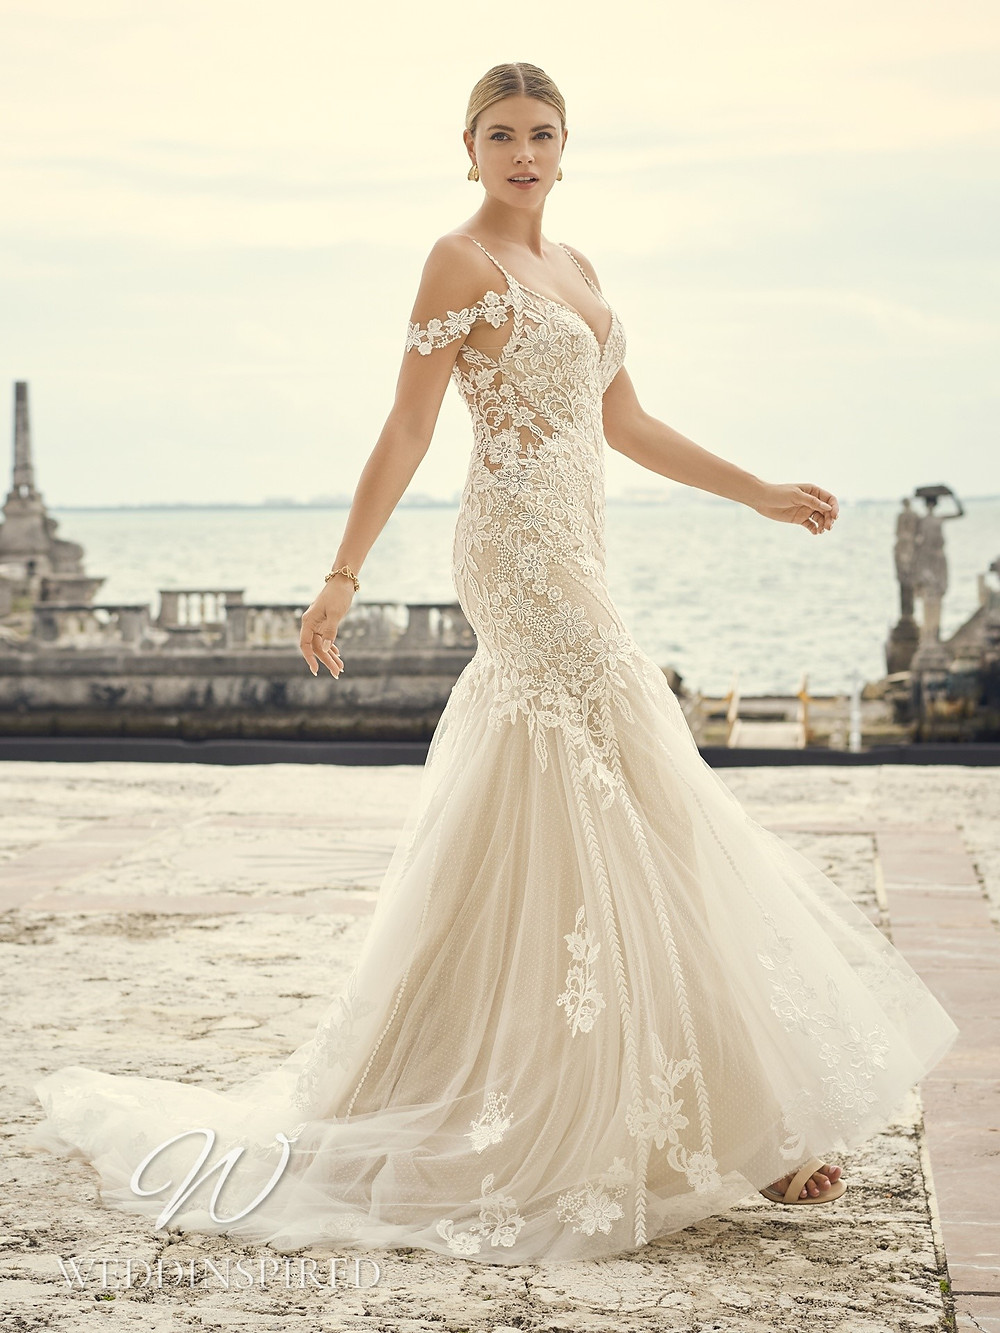 A Sottero & Midgley 2021 ivory off the shoulder lace mermaid wedding dress